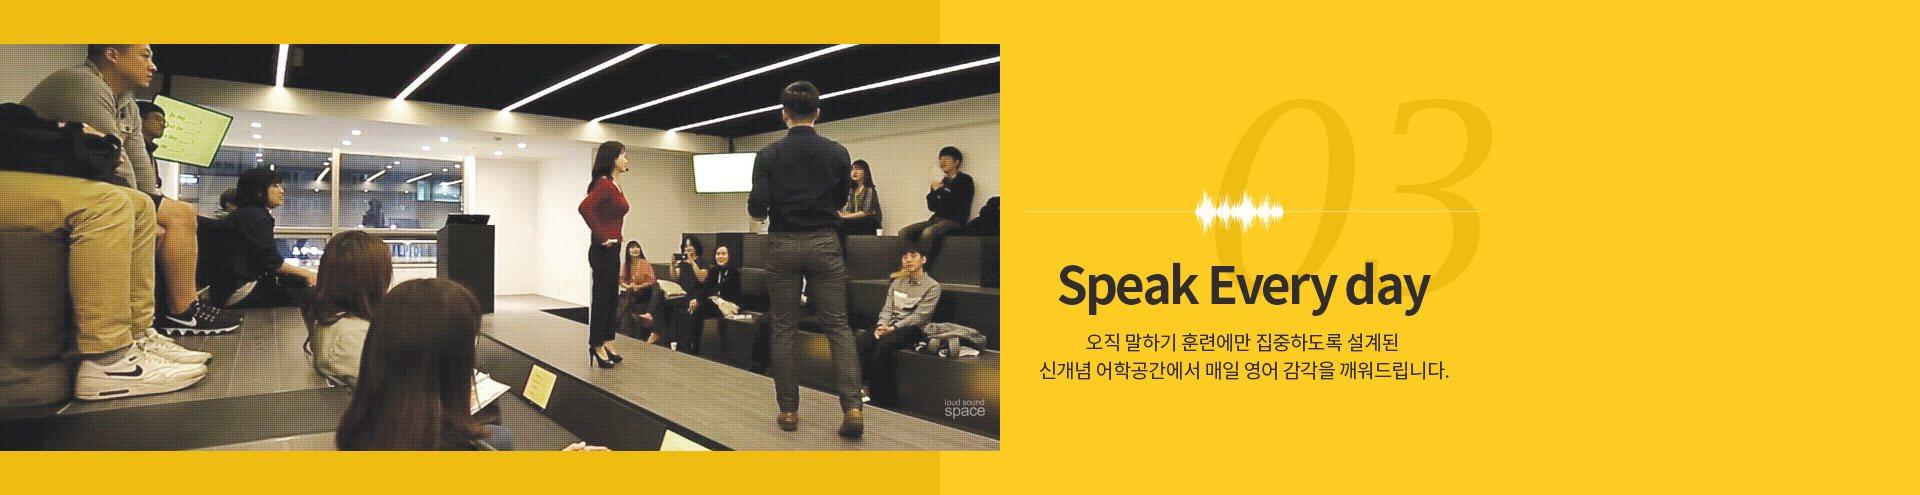 3 Speak Every day